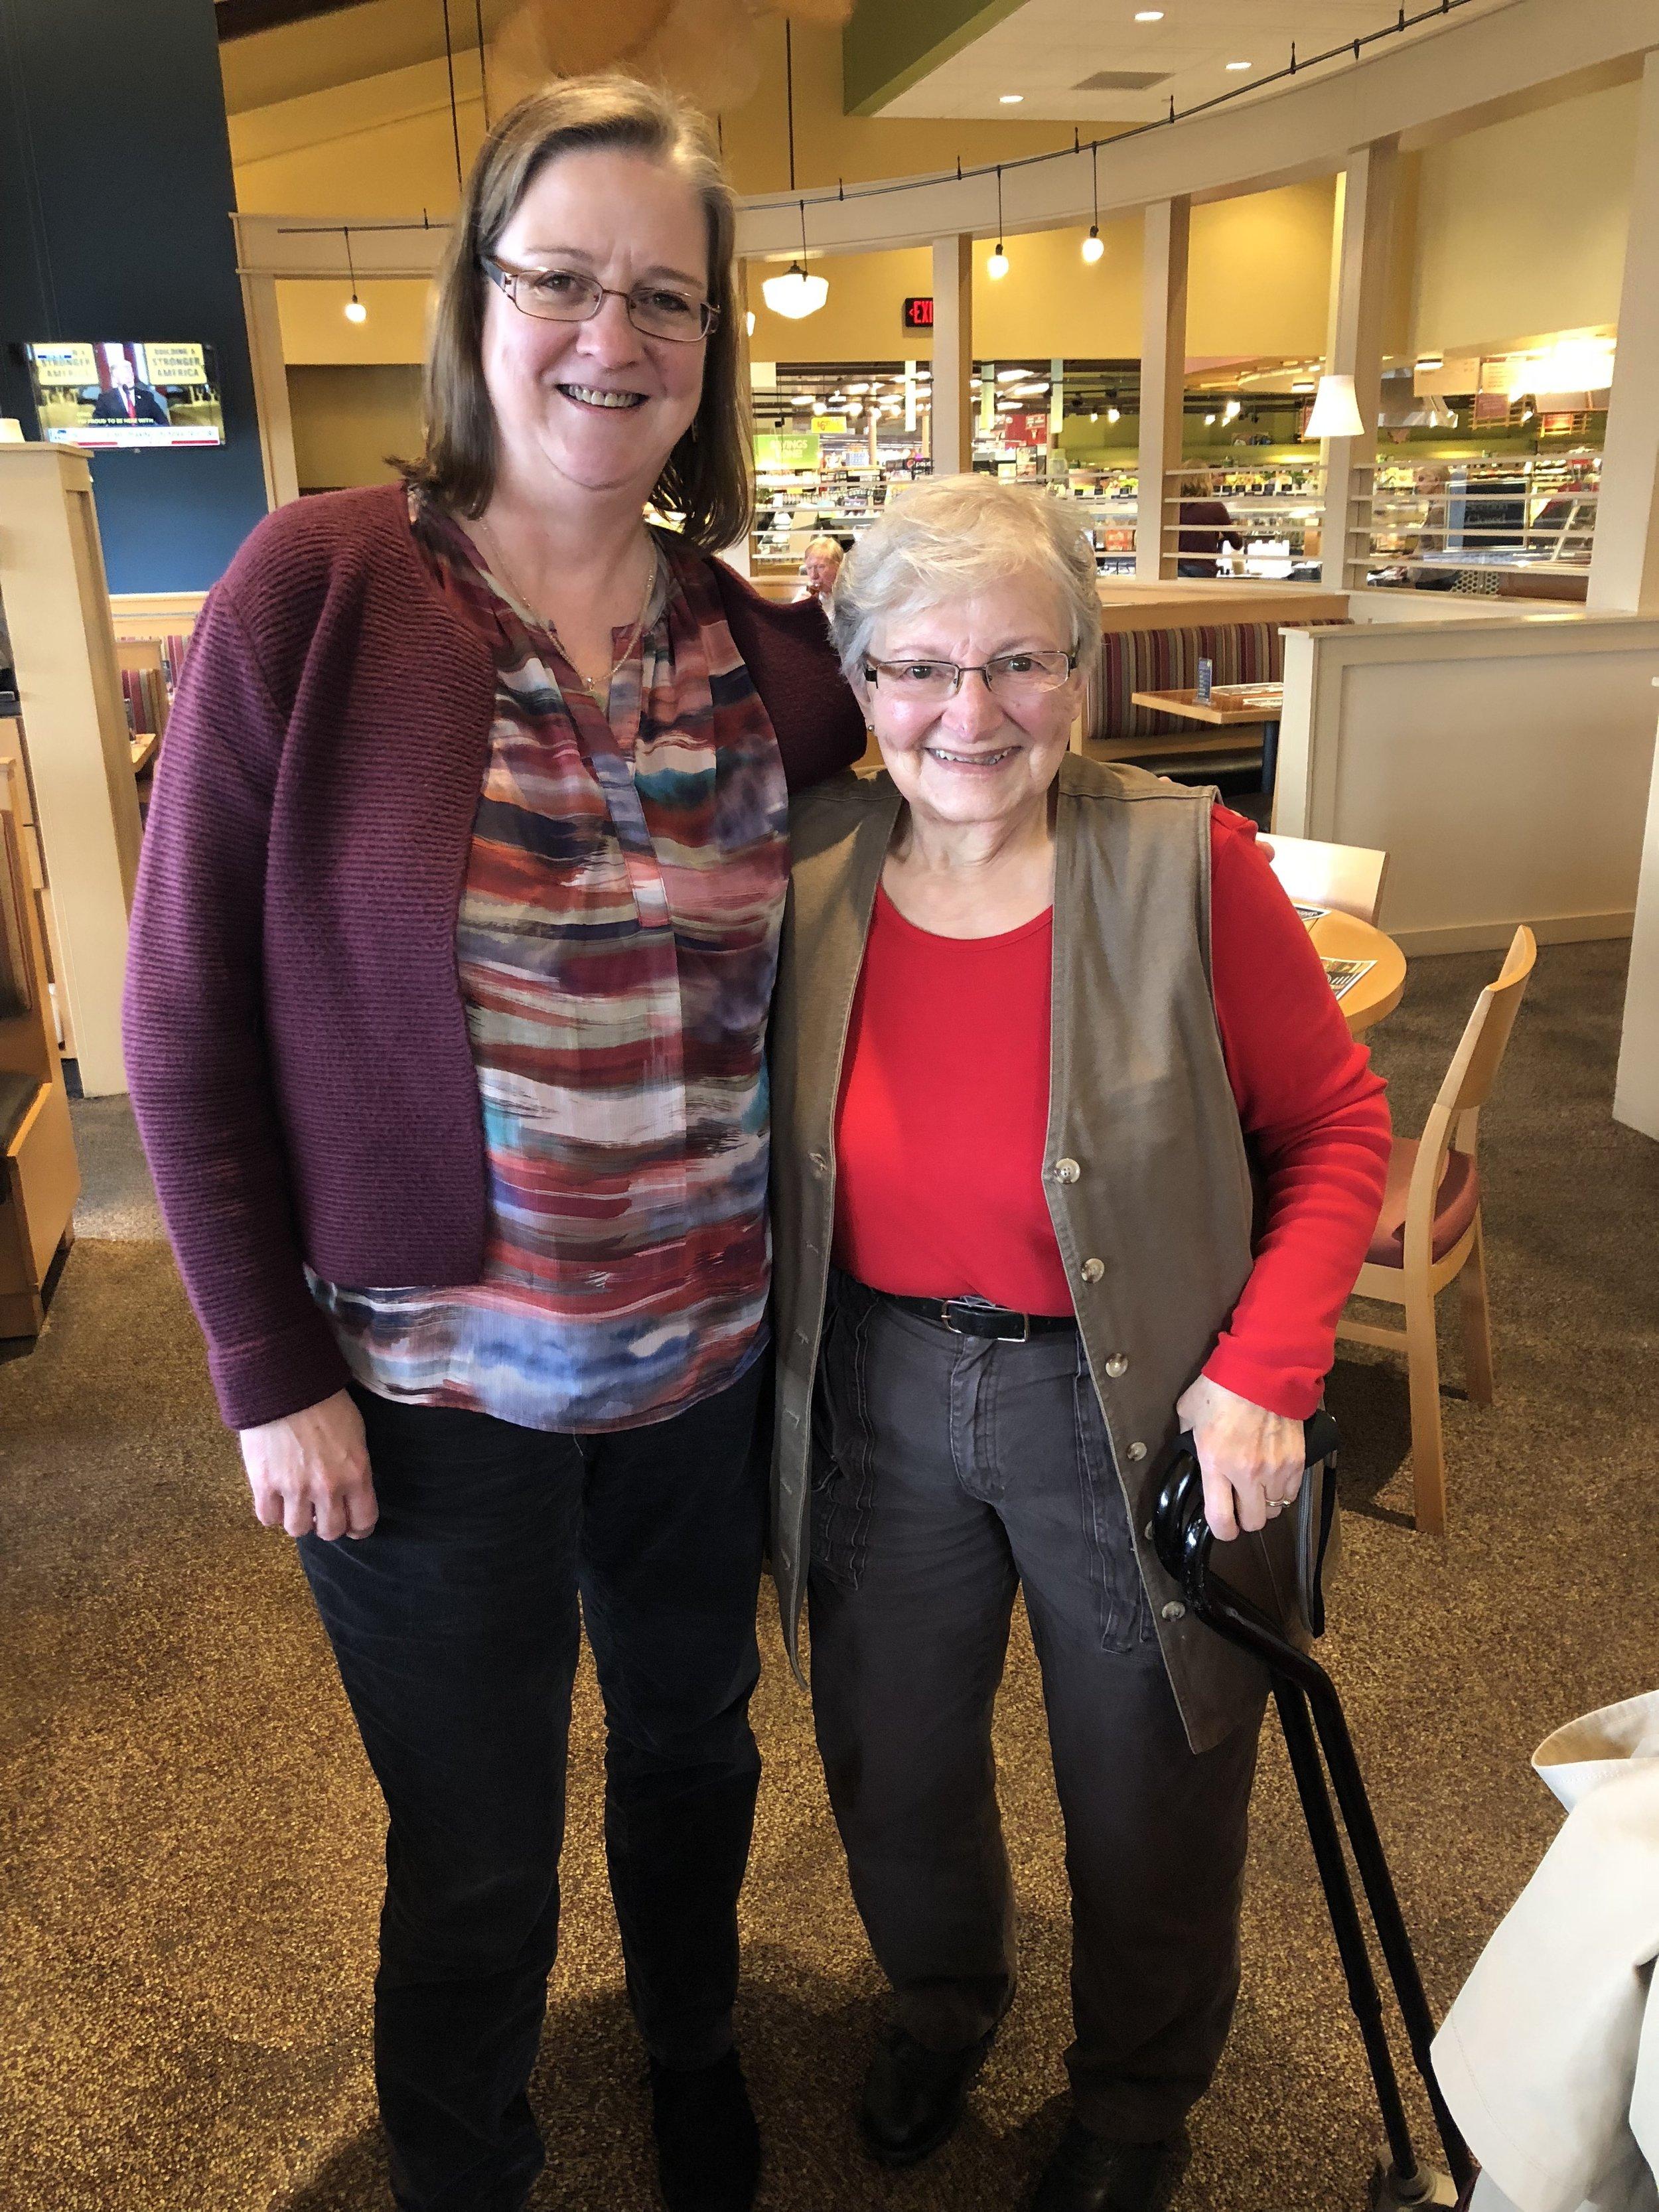 Volunteer Coordinator, Margaret Mullen pictured with Mary Kathryn, hospice volunteer.